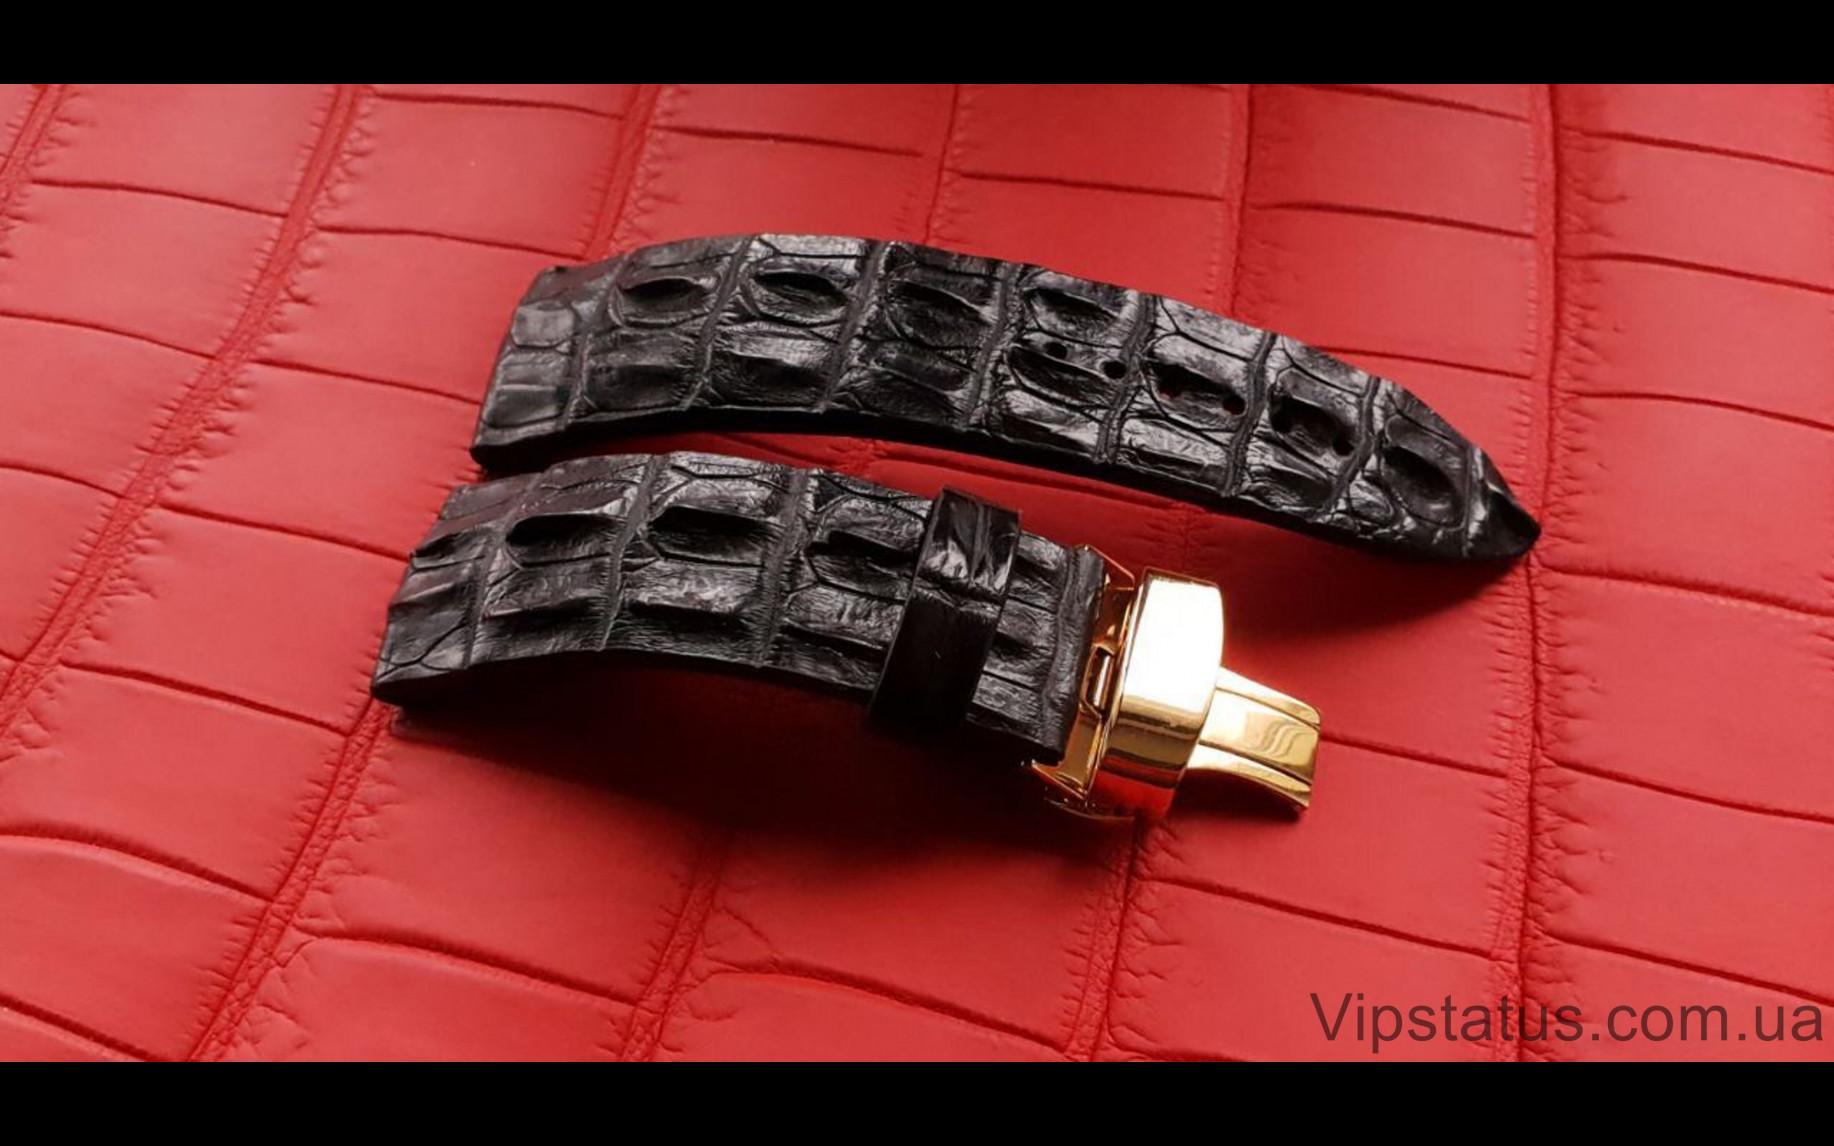 Elite Элитный ремешок для часов Girard-Perregaux кожа крокодила Elite Crocodile Strap for Girard-Perregaux watches image 1